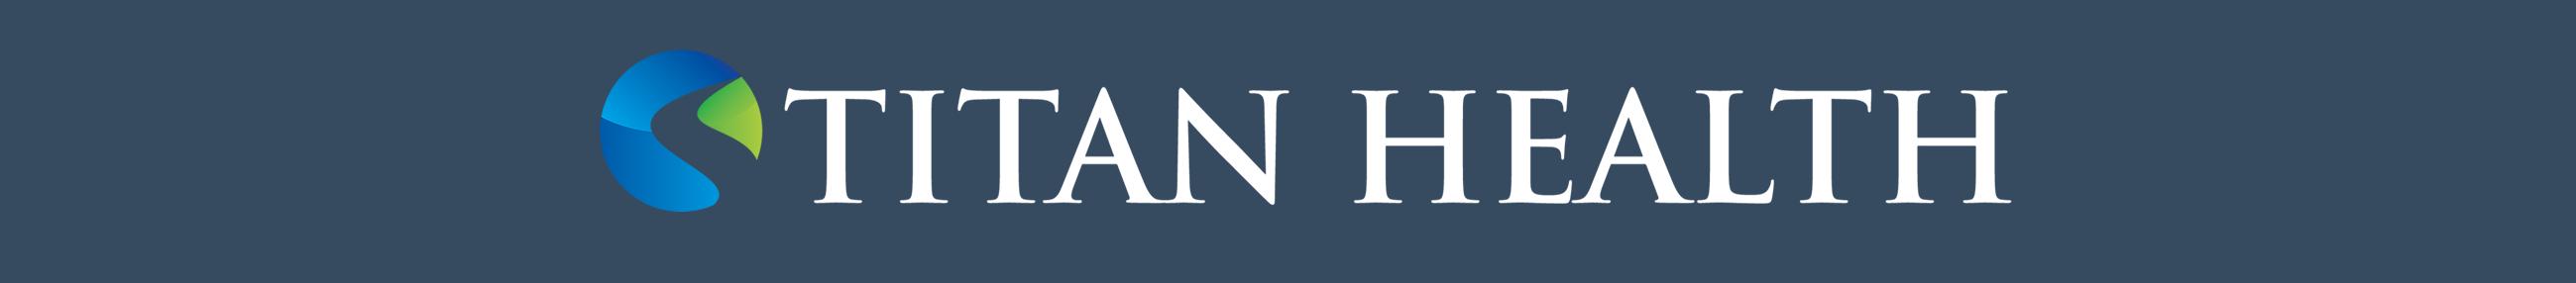 Titan Health Management Solutions